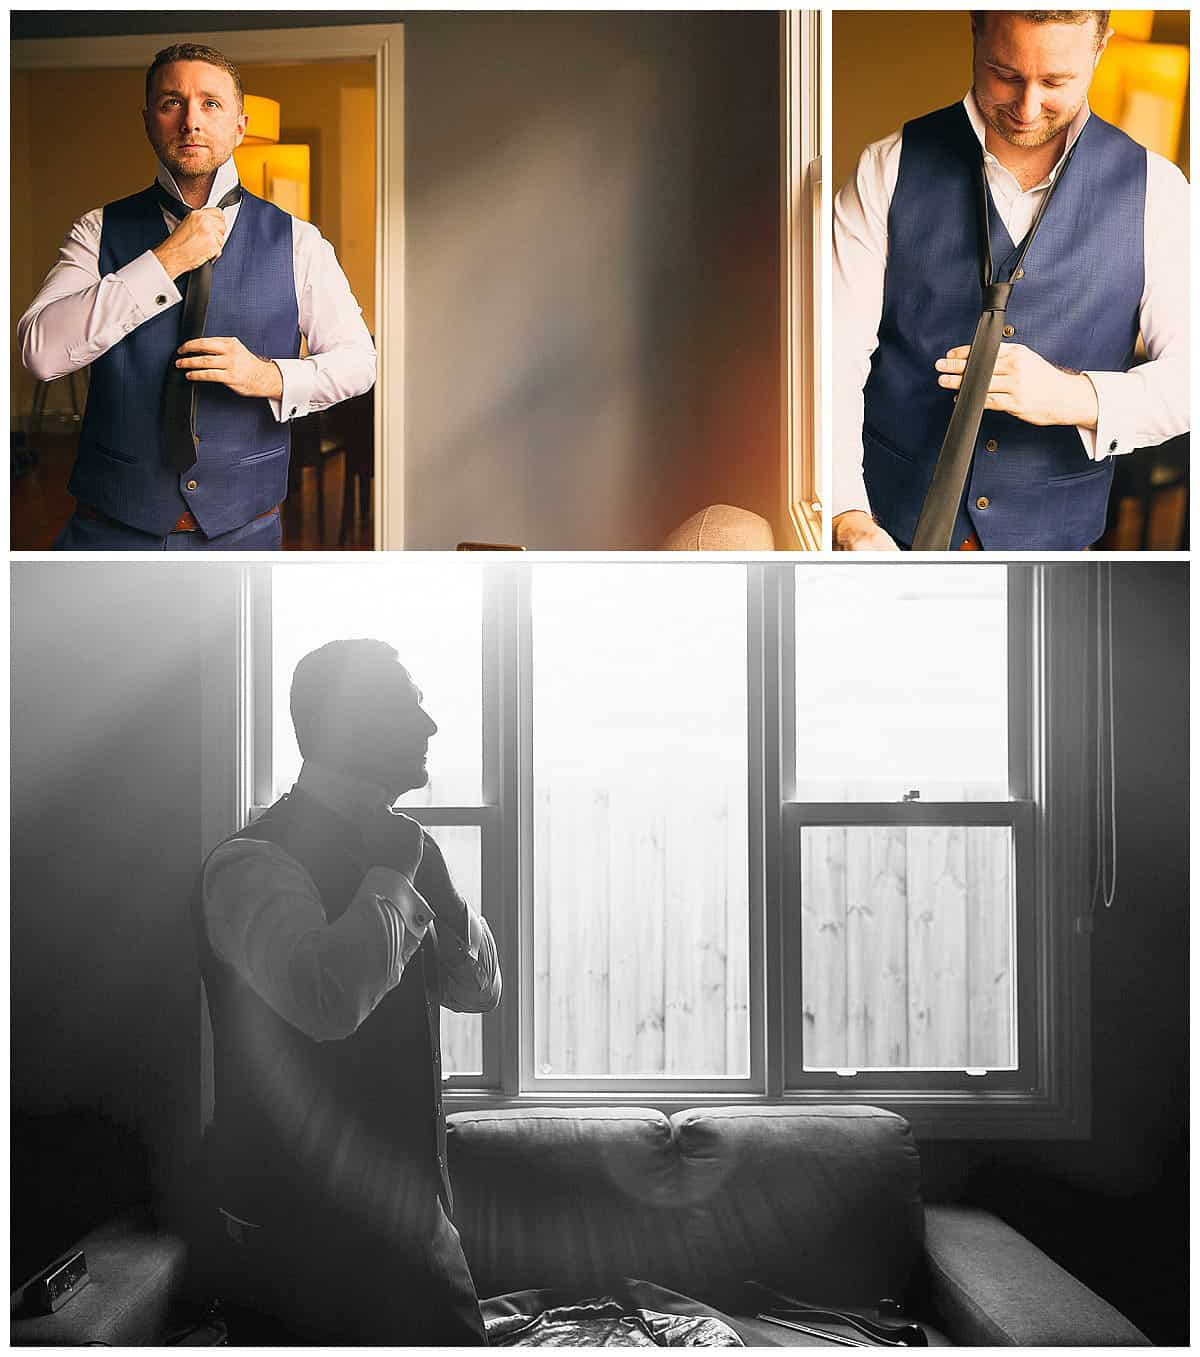 Groom Davor Getting Ready - 3 Piece Suit, Melbourne City Wedding